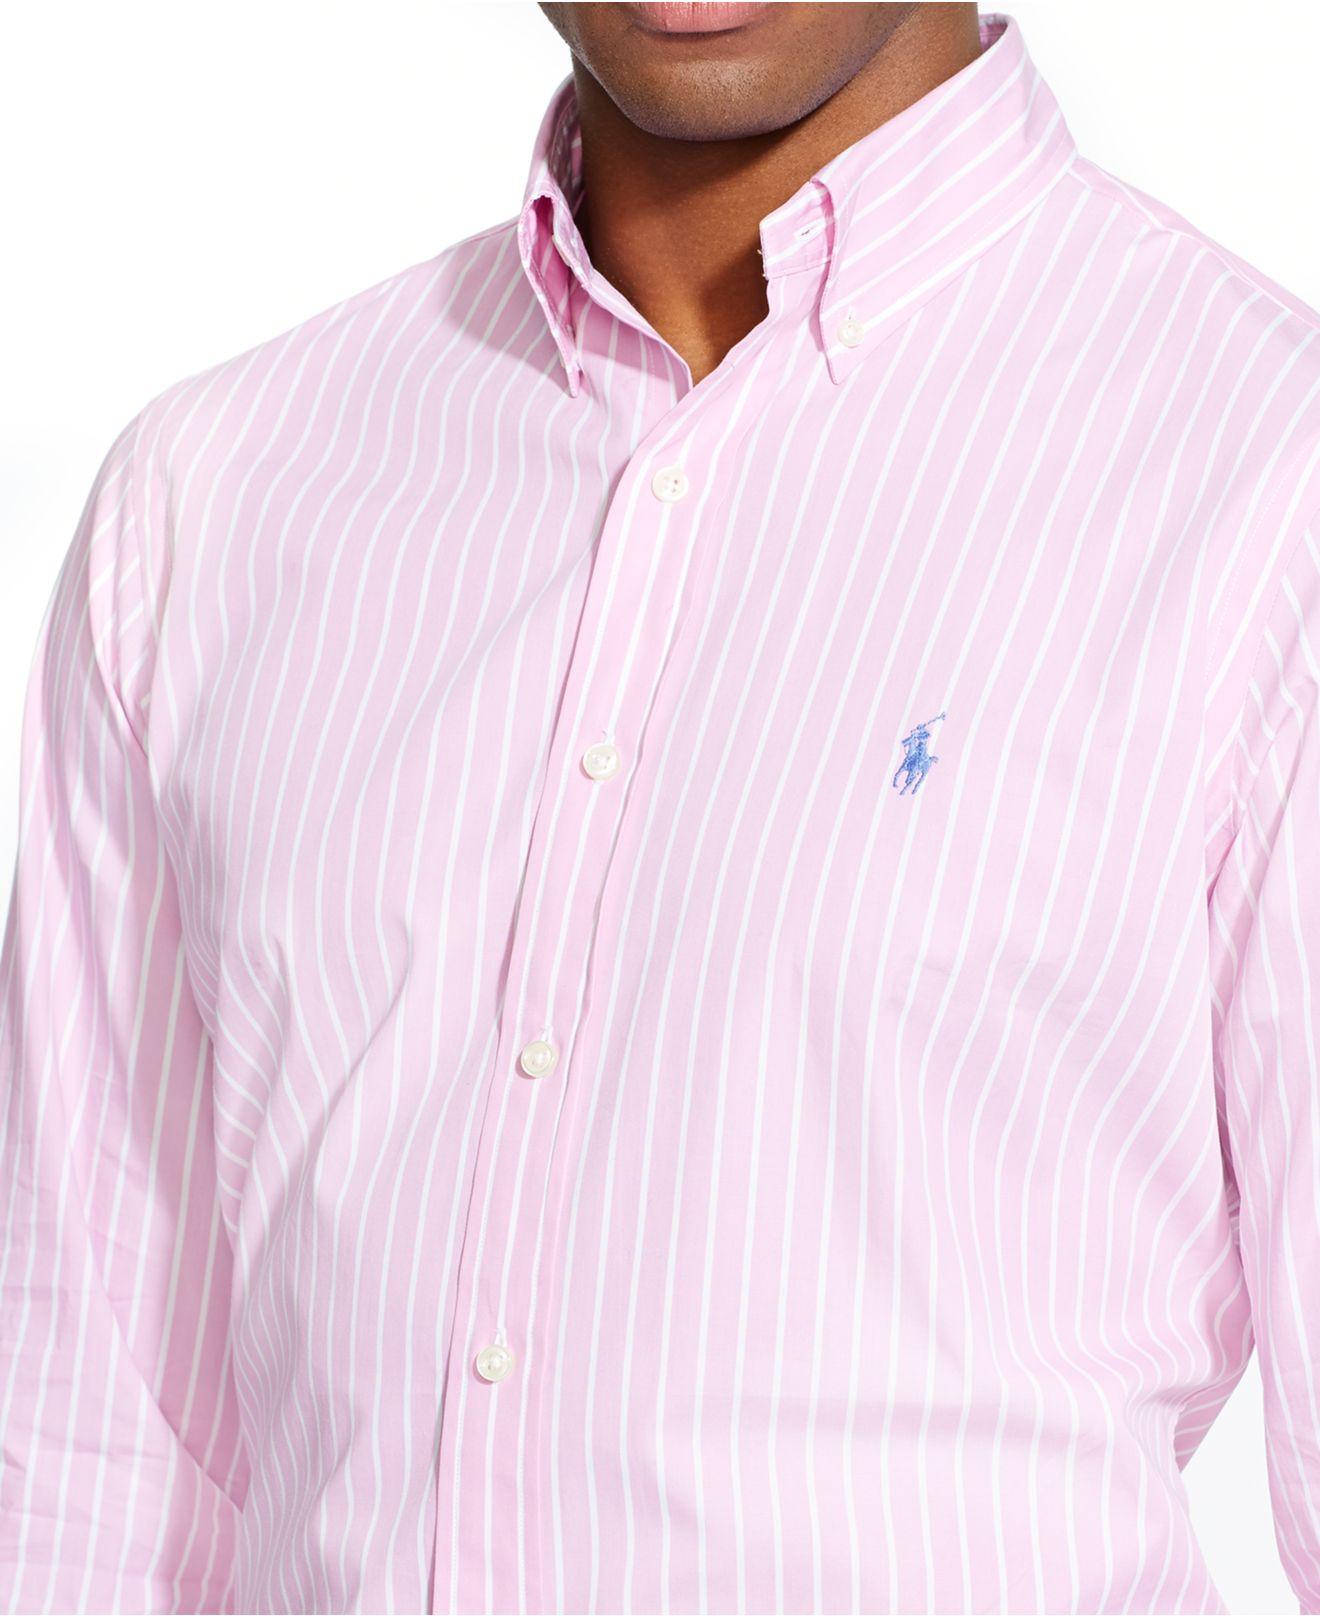 1c8593ee2d Polo Ralph Lauren Striped Poplin Shirt in Pink for Men - Lyst